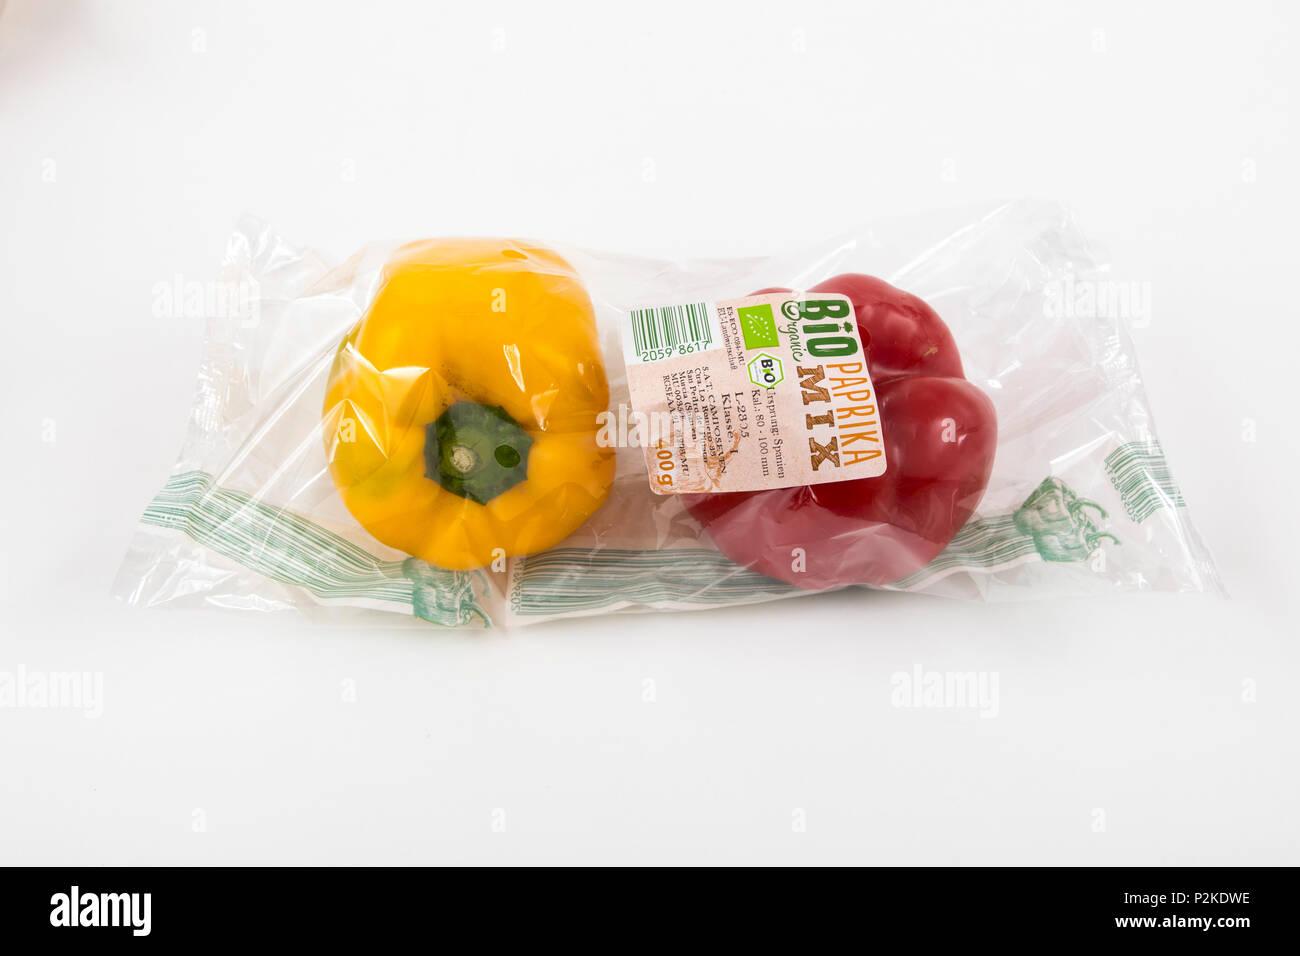 Fresh food, organic food, organic vegetables, each